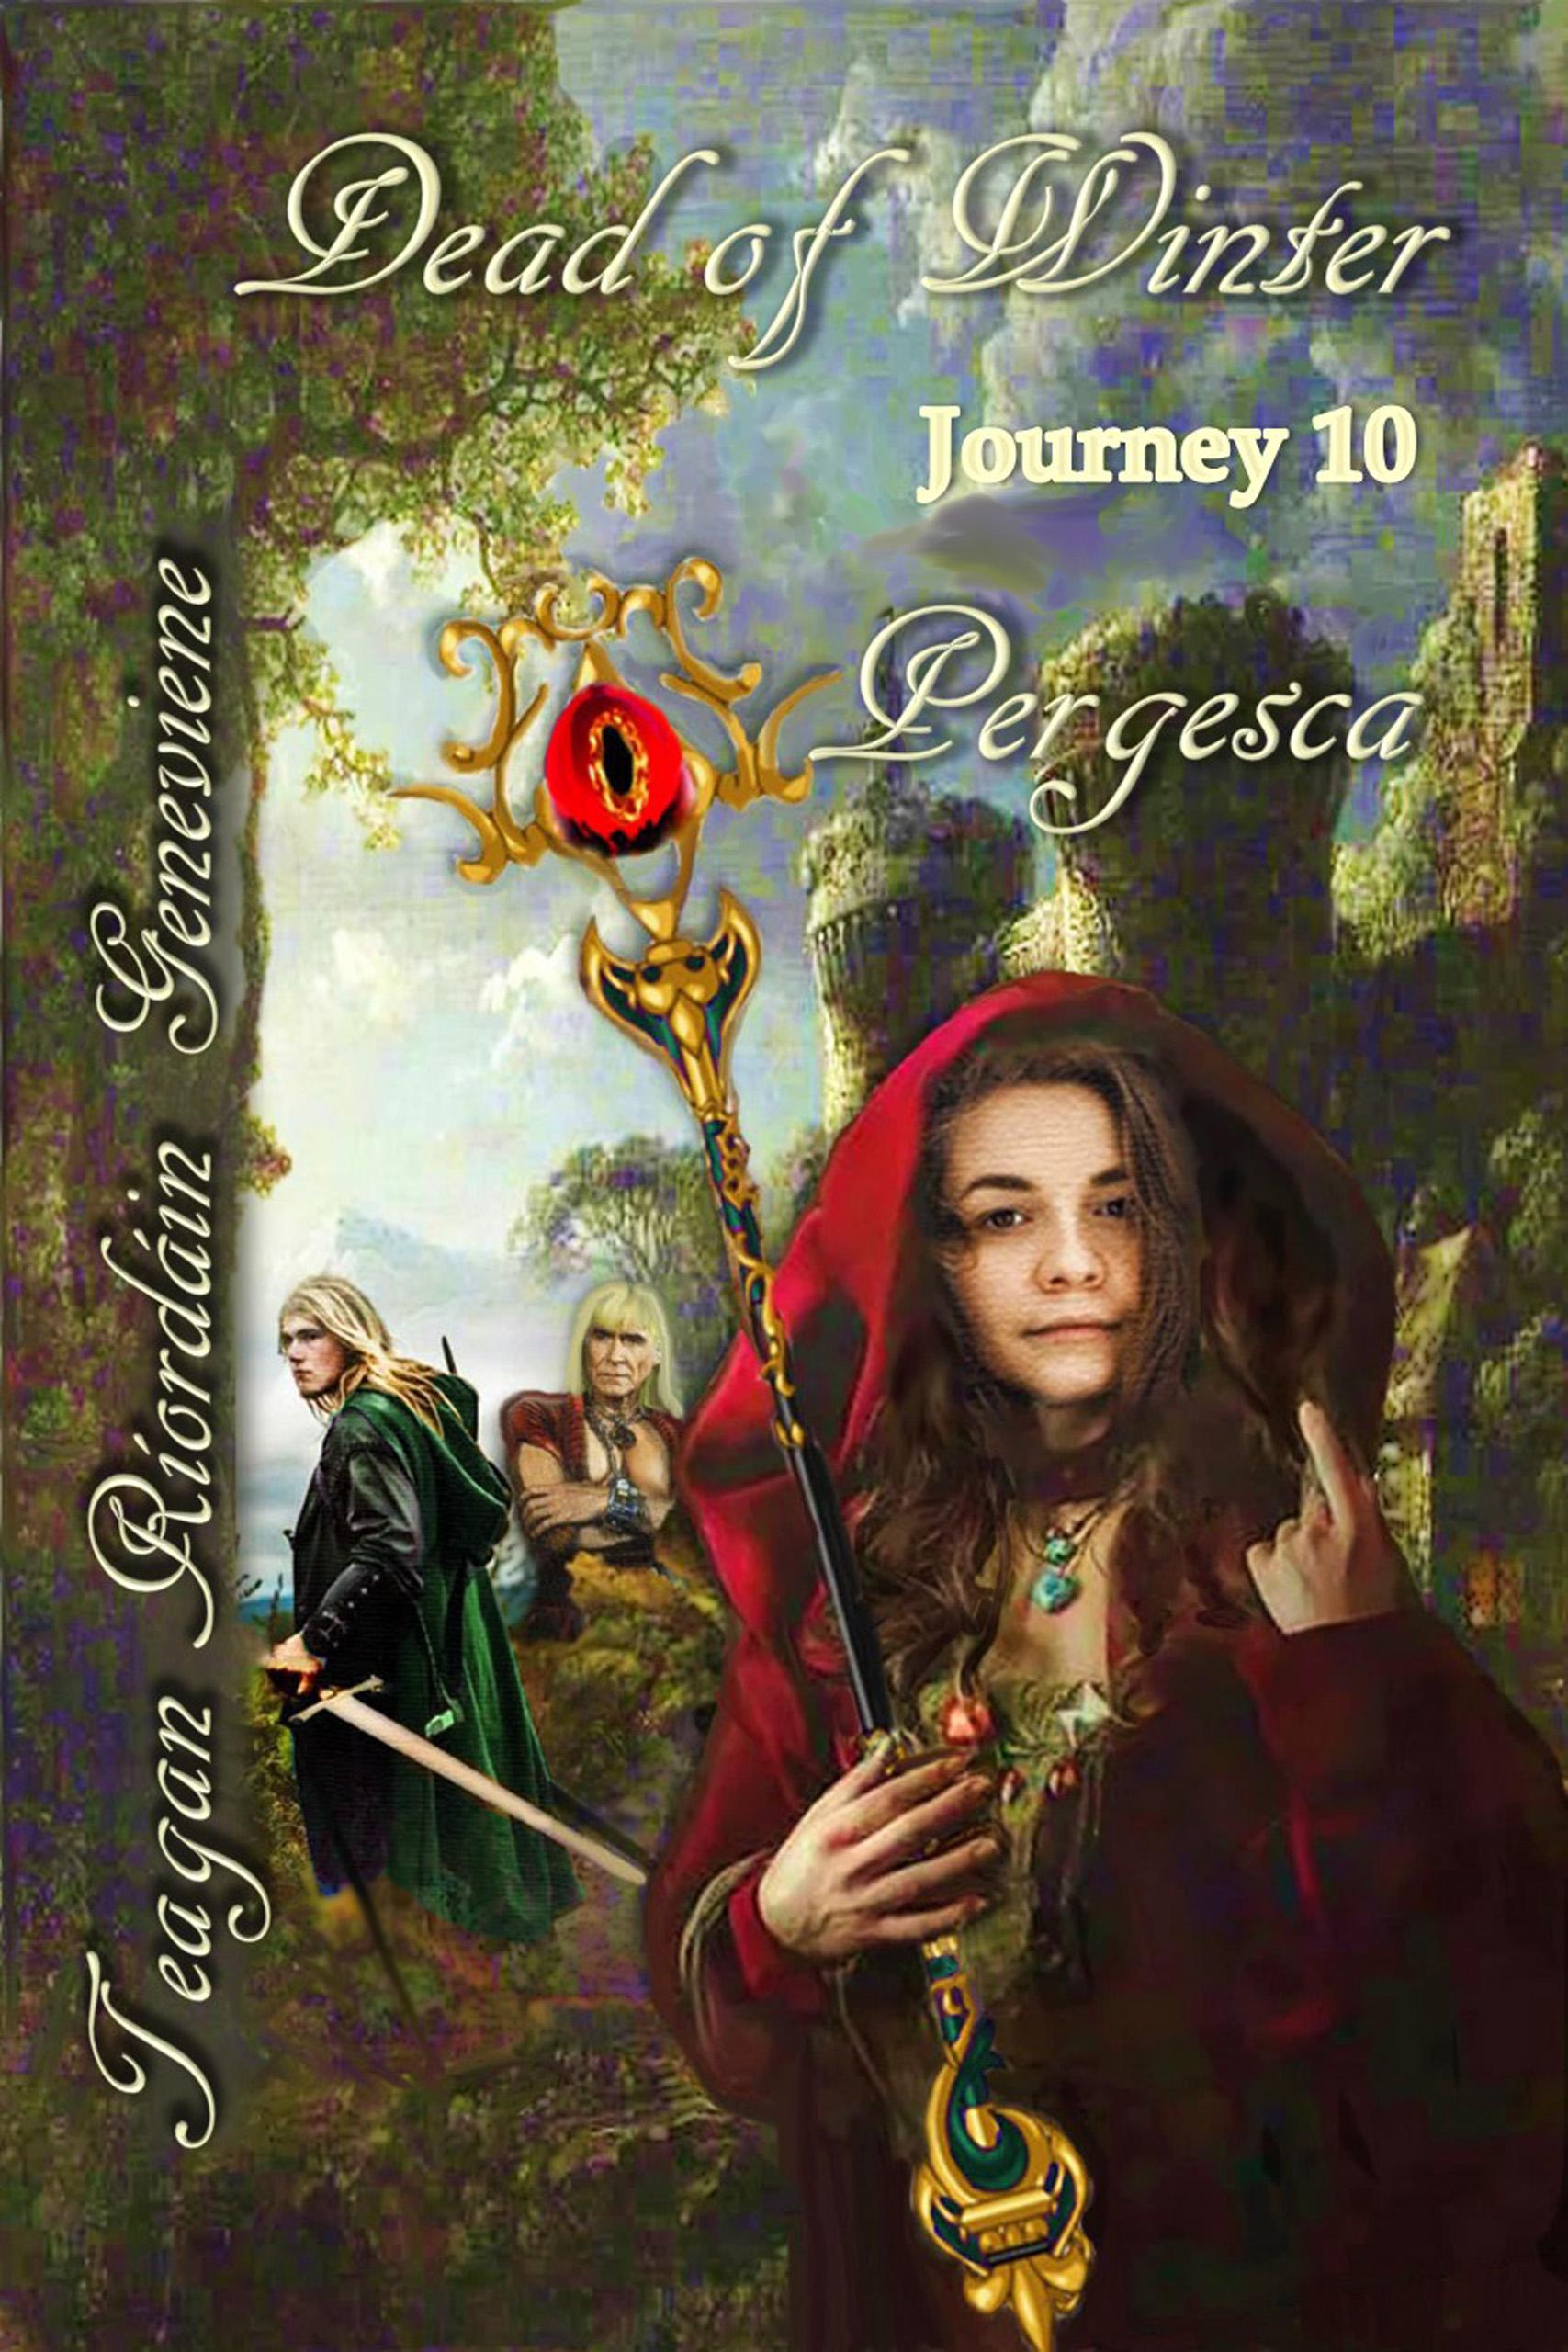 Dead of Winter: Journey 10, Pergesca by Teagan Ríordáin Geneviene